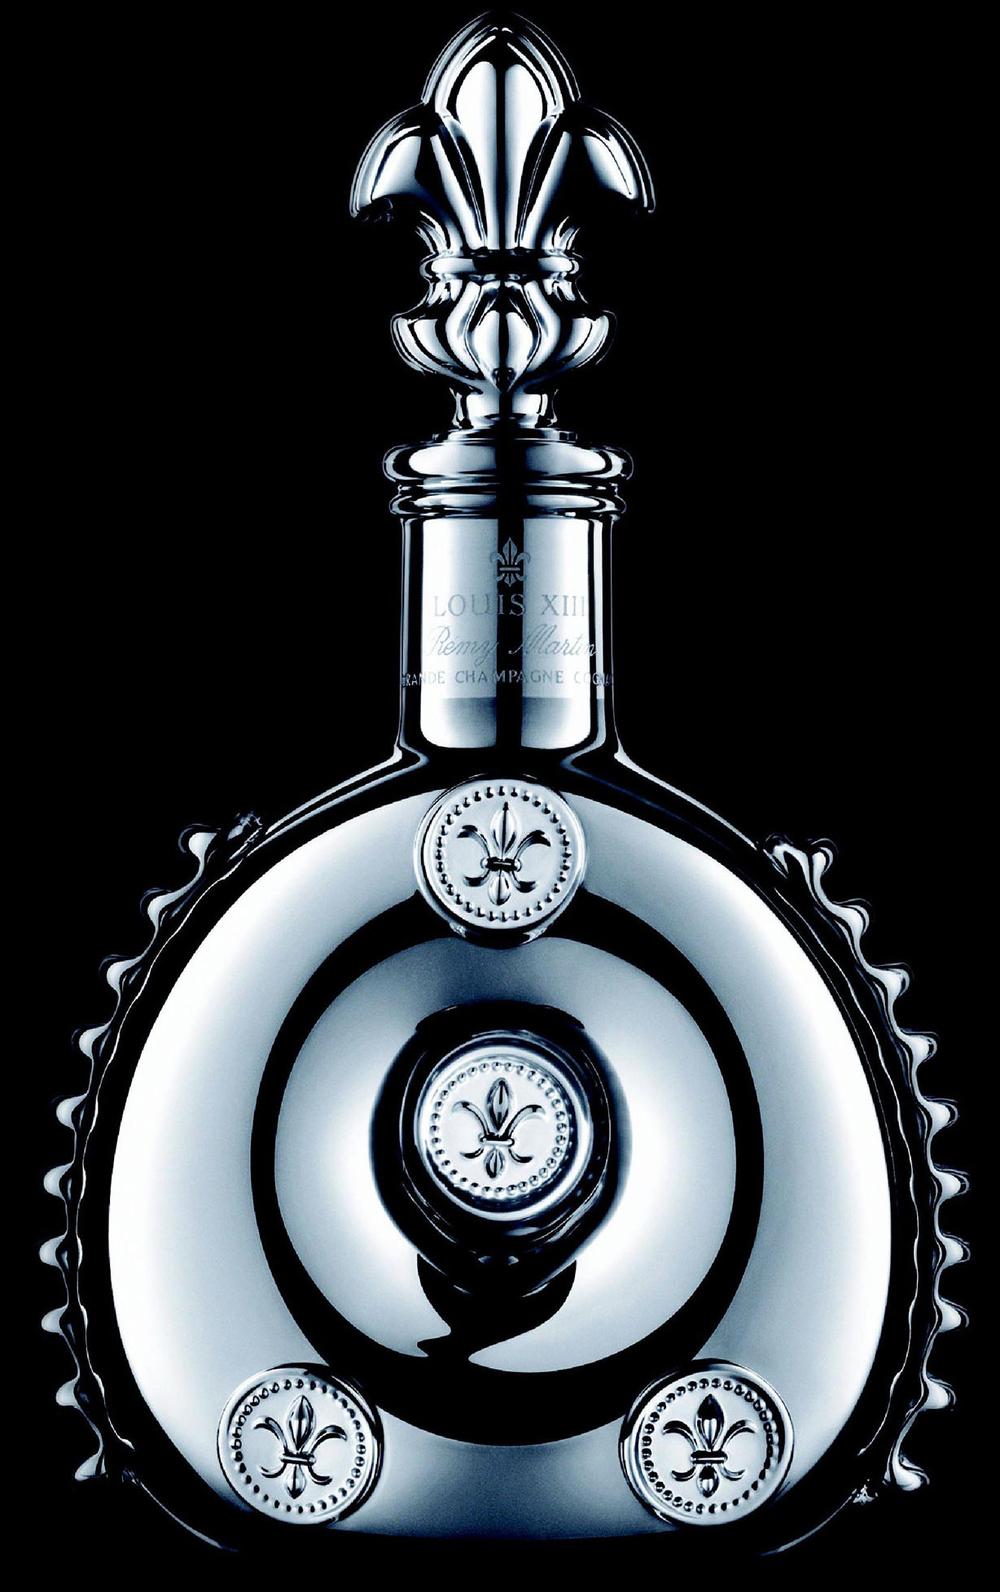 Louis XIII Black Pearl